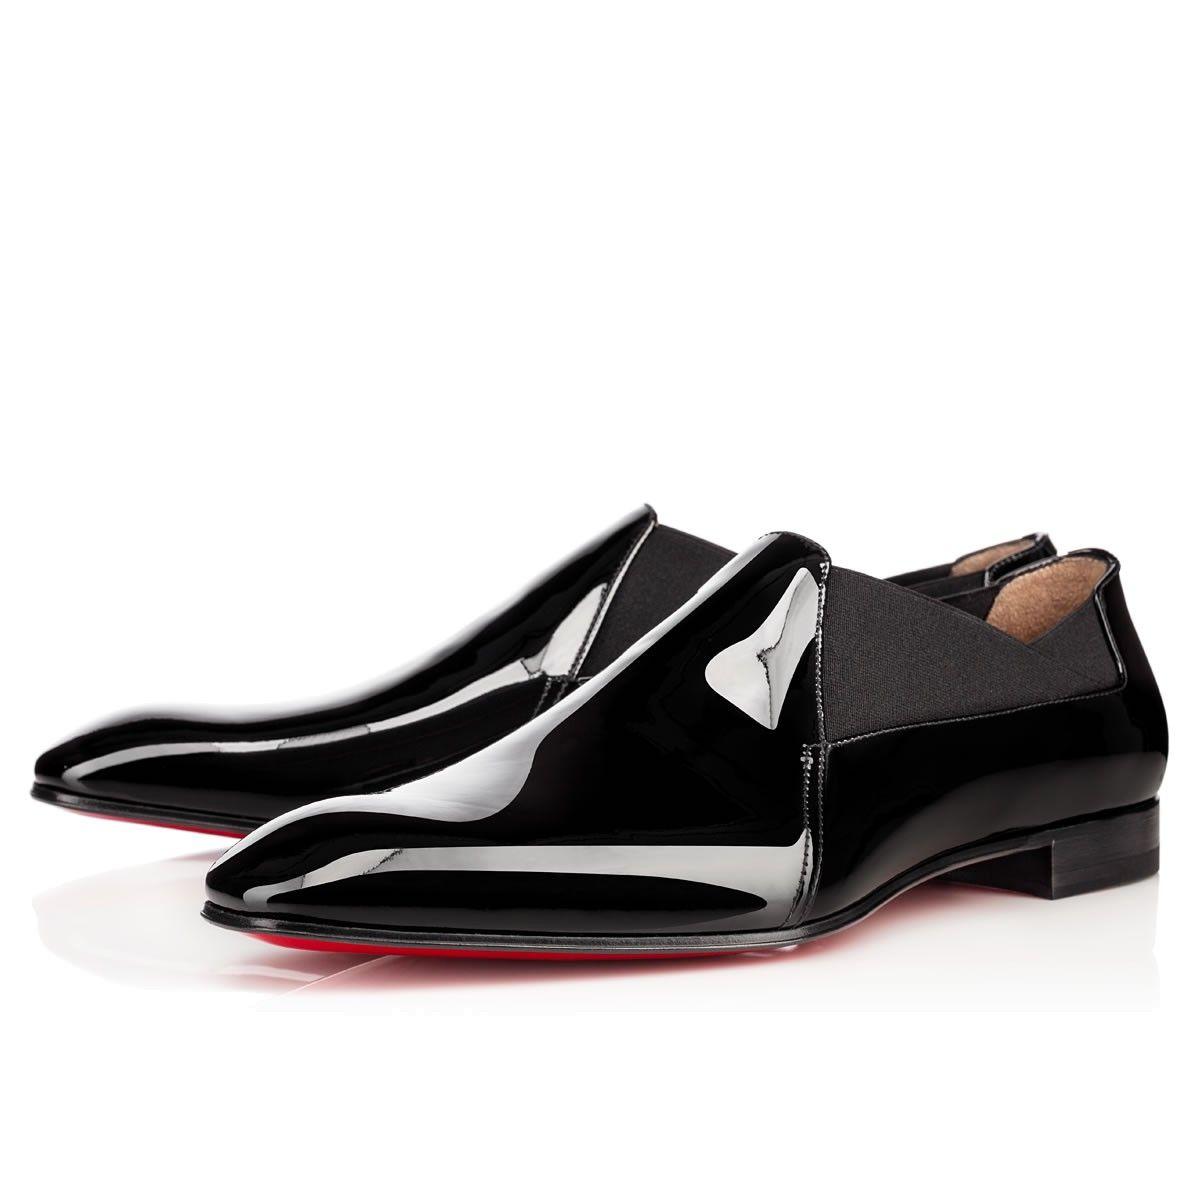 Shoes - Opero Flat - Christian Louboutin